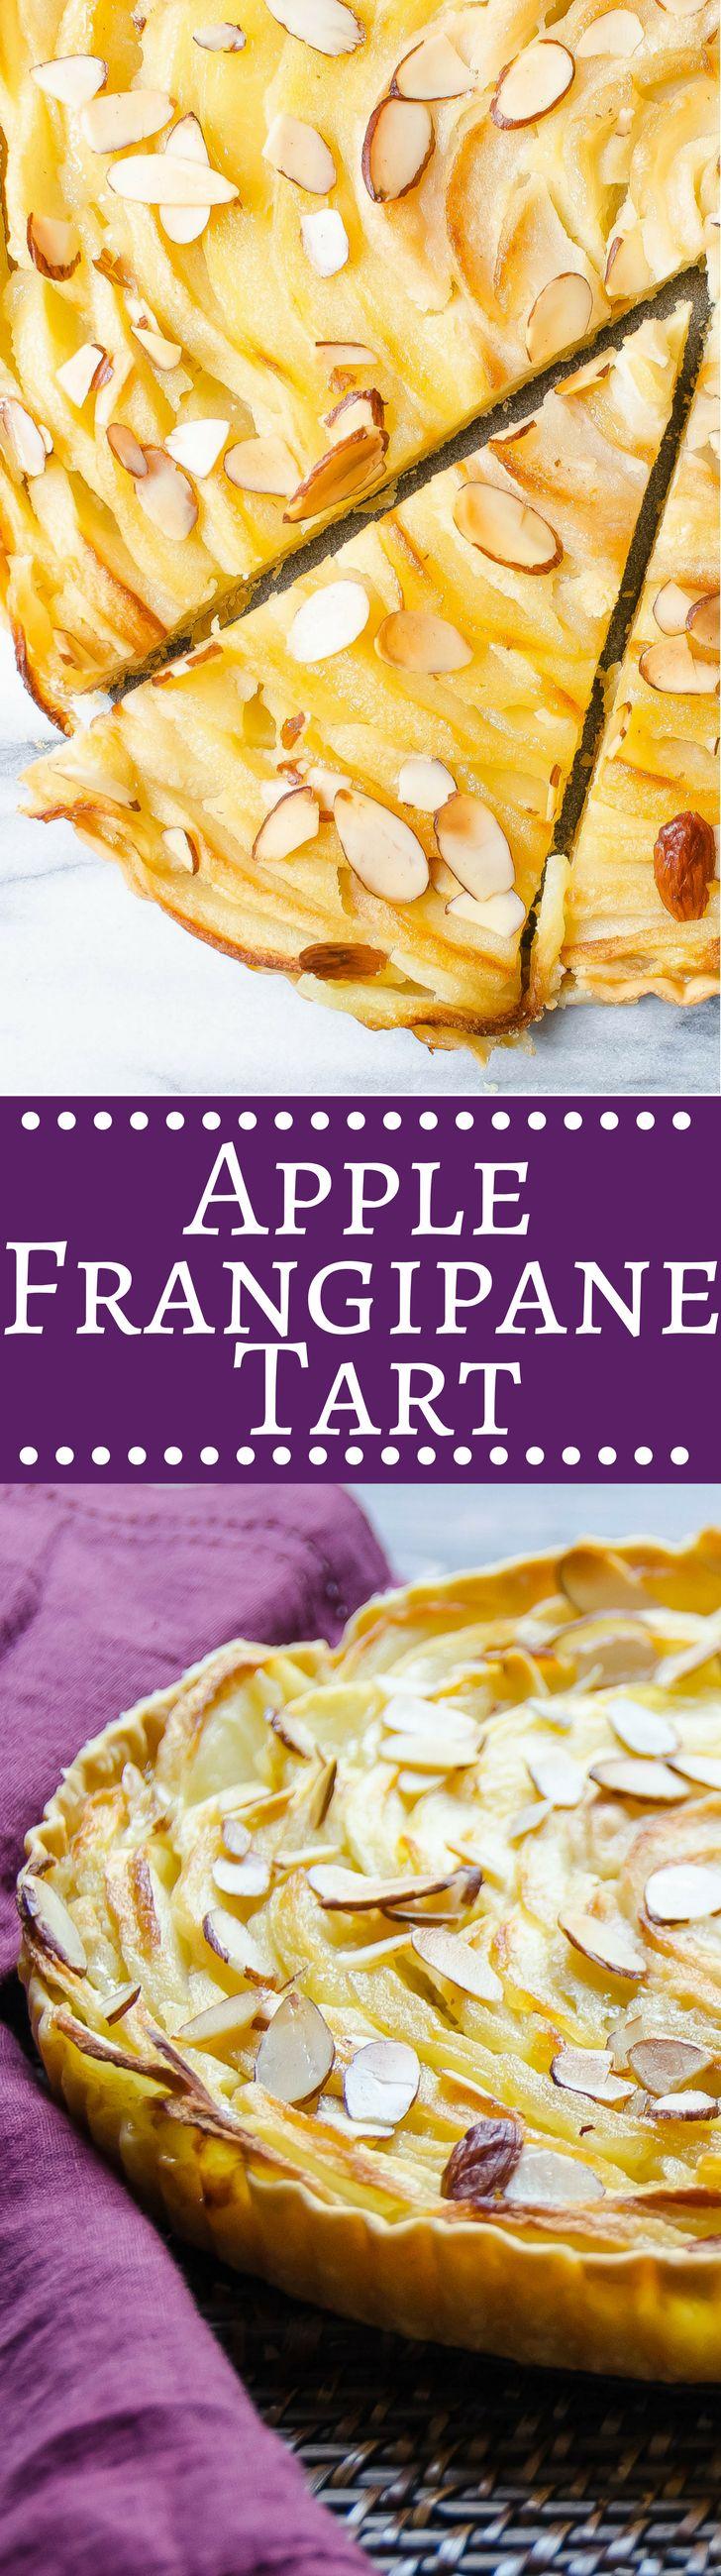 Apple Frangipane Tart   Garlic & Zest